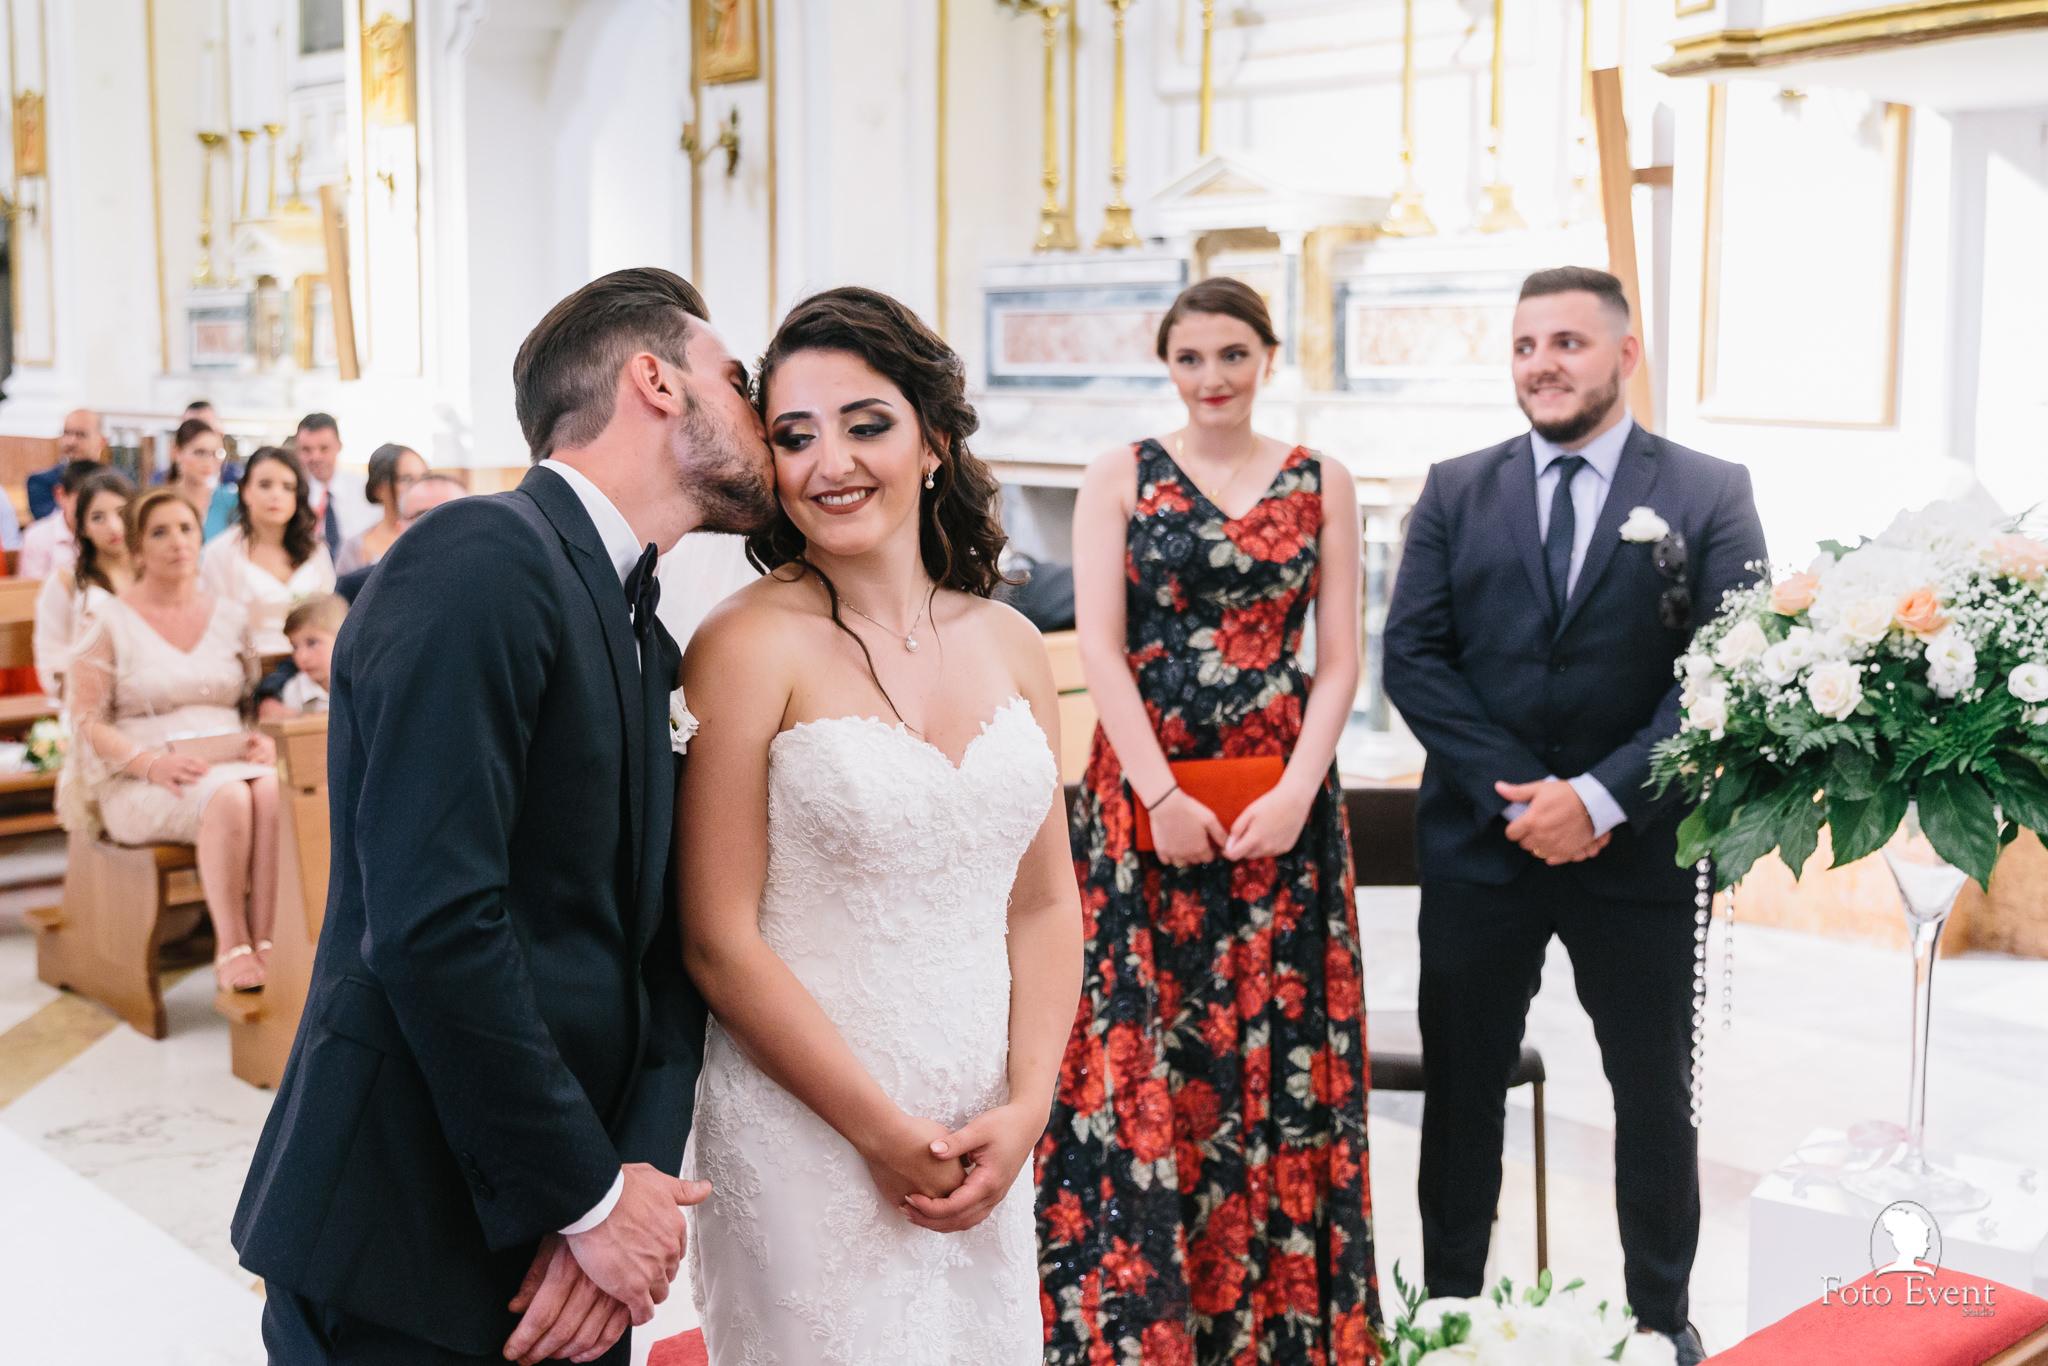 033-2019-08-31-Matrimonio-Serena-e-Saverio-Tarantino-5DE-1099